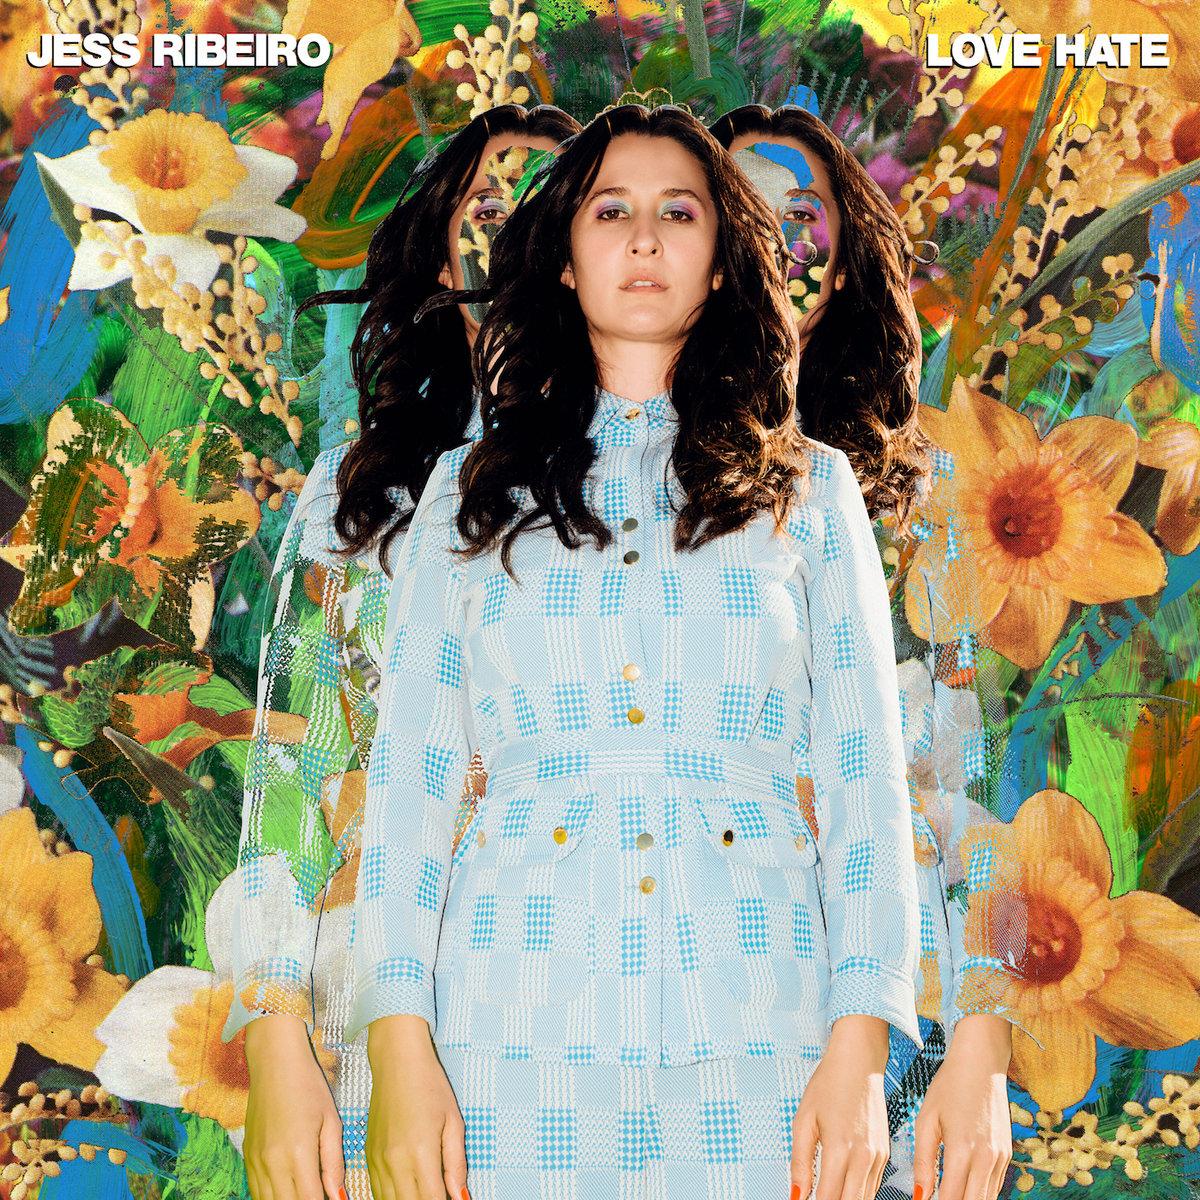 Jess Ribeiro   LOve hate